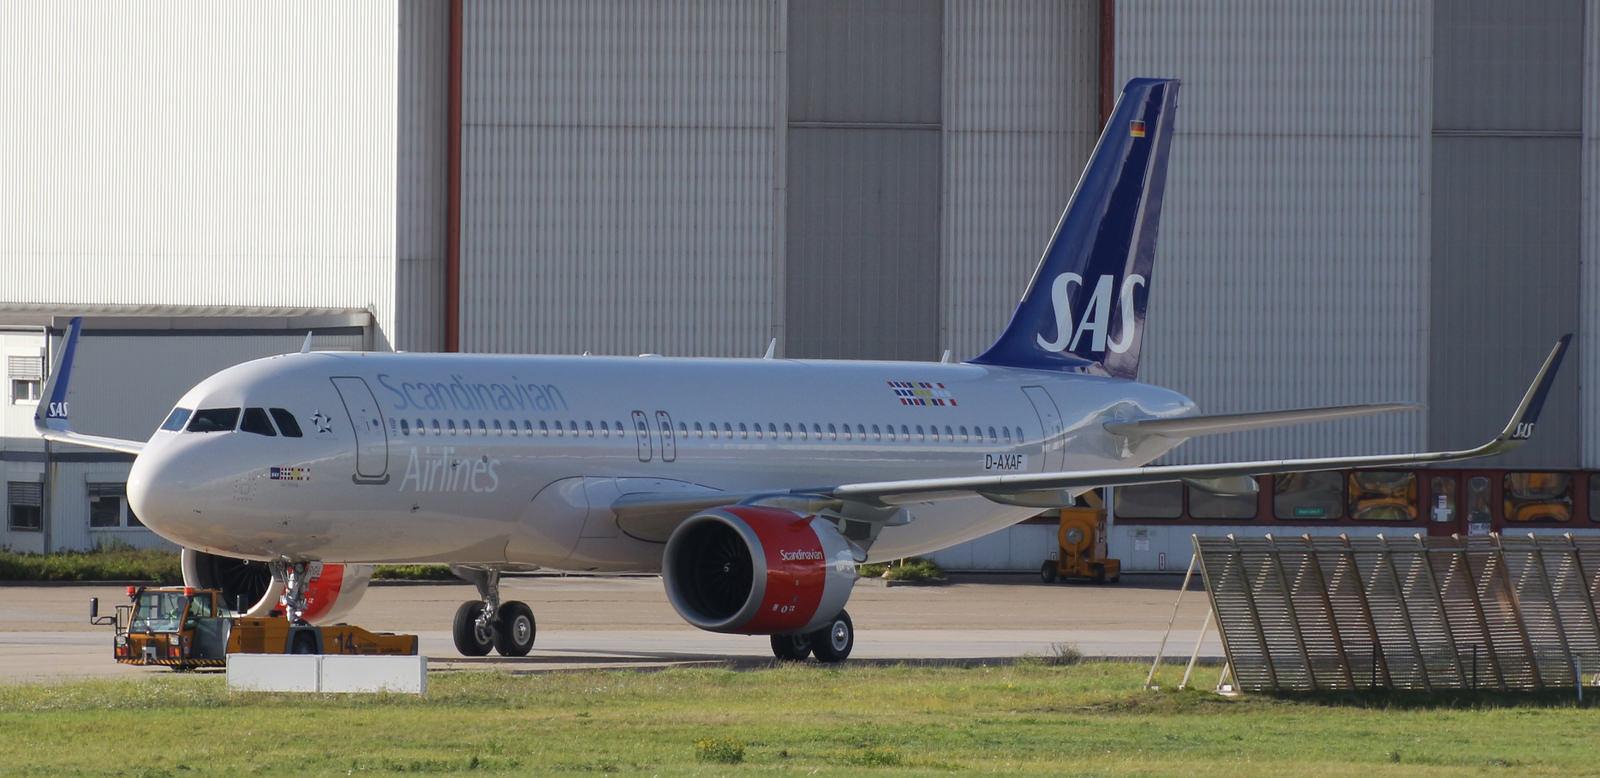 A320-251N, SAS Scandinavian Airlines, D-AXAF, LN-RGL (Foto: XFW Spotter)